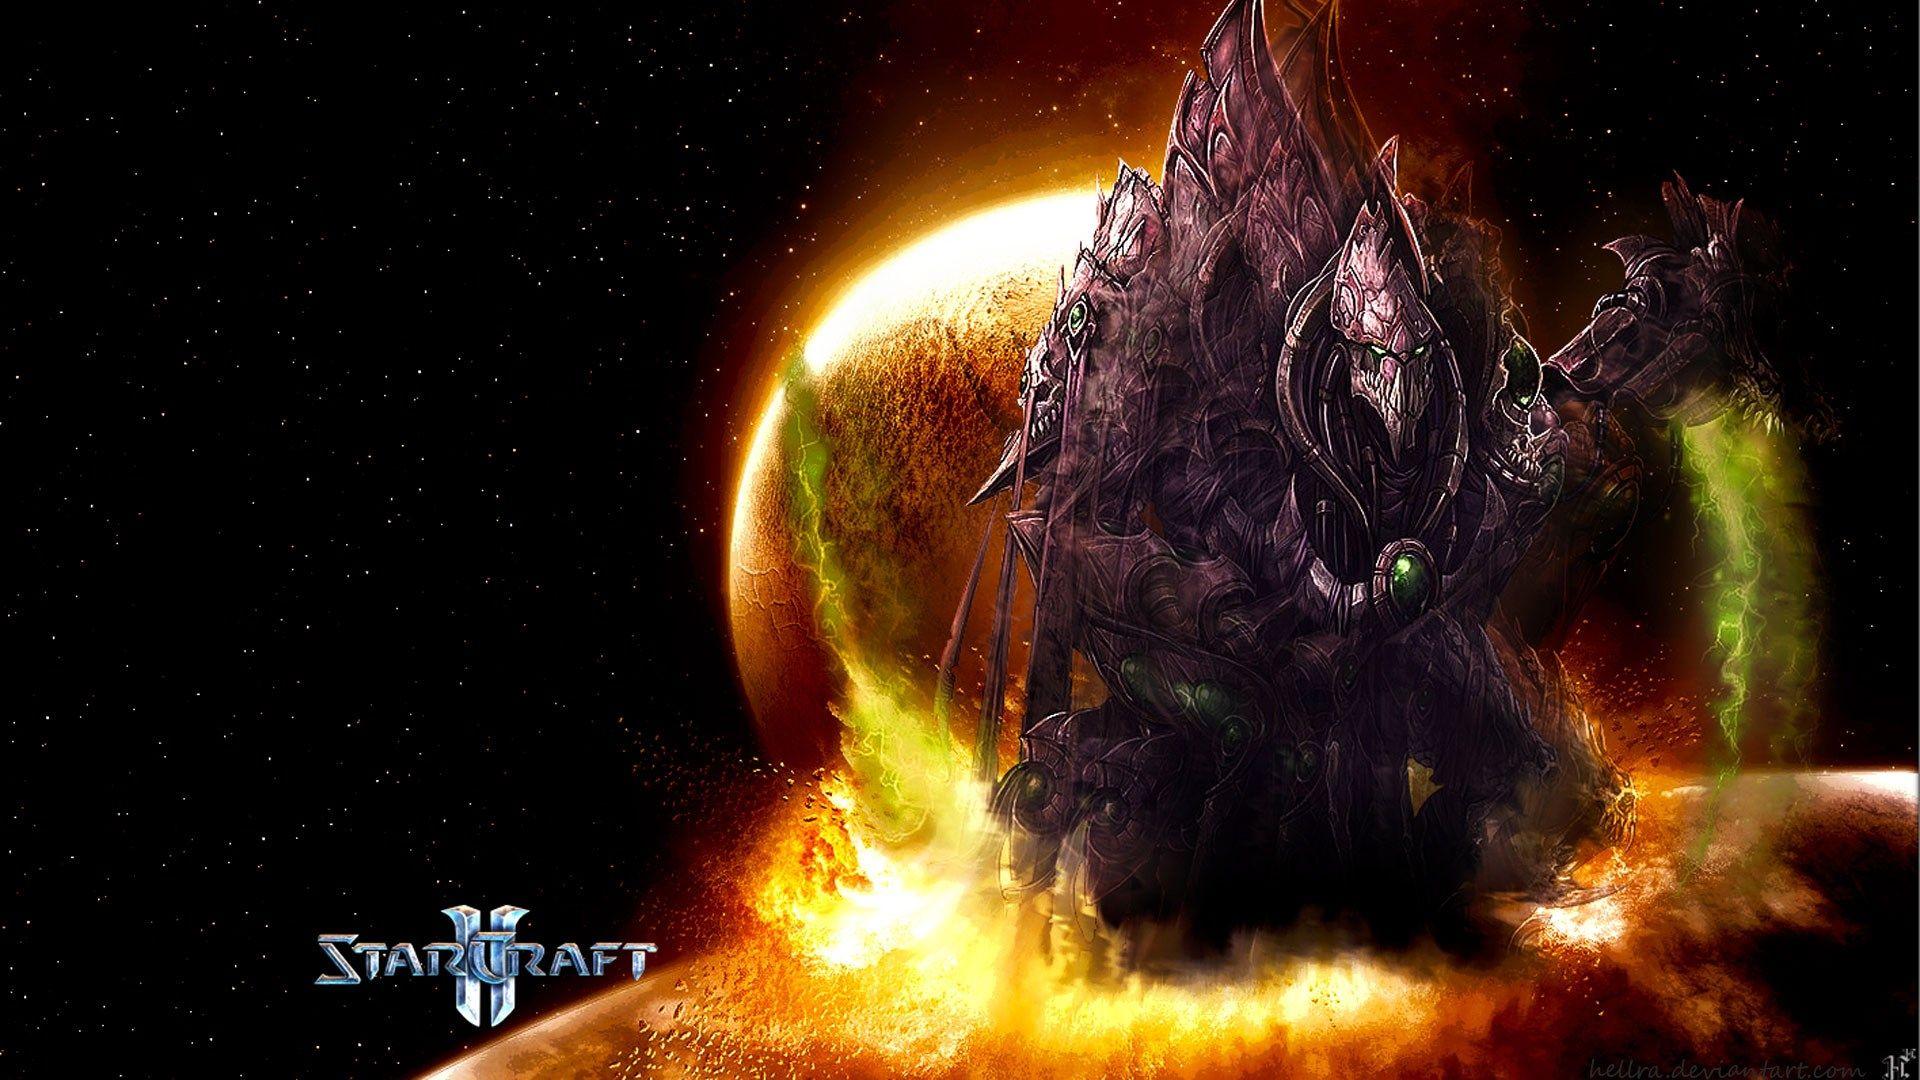 Ripley Nail - starcraft ii background hd - 1920x1080 px